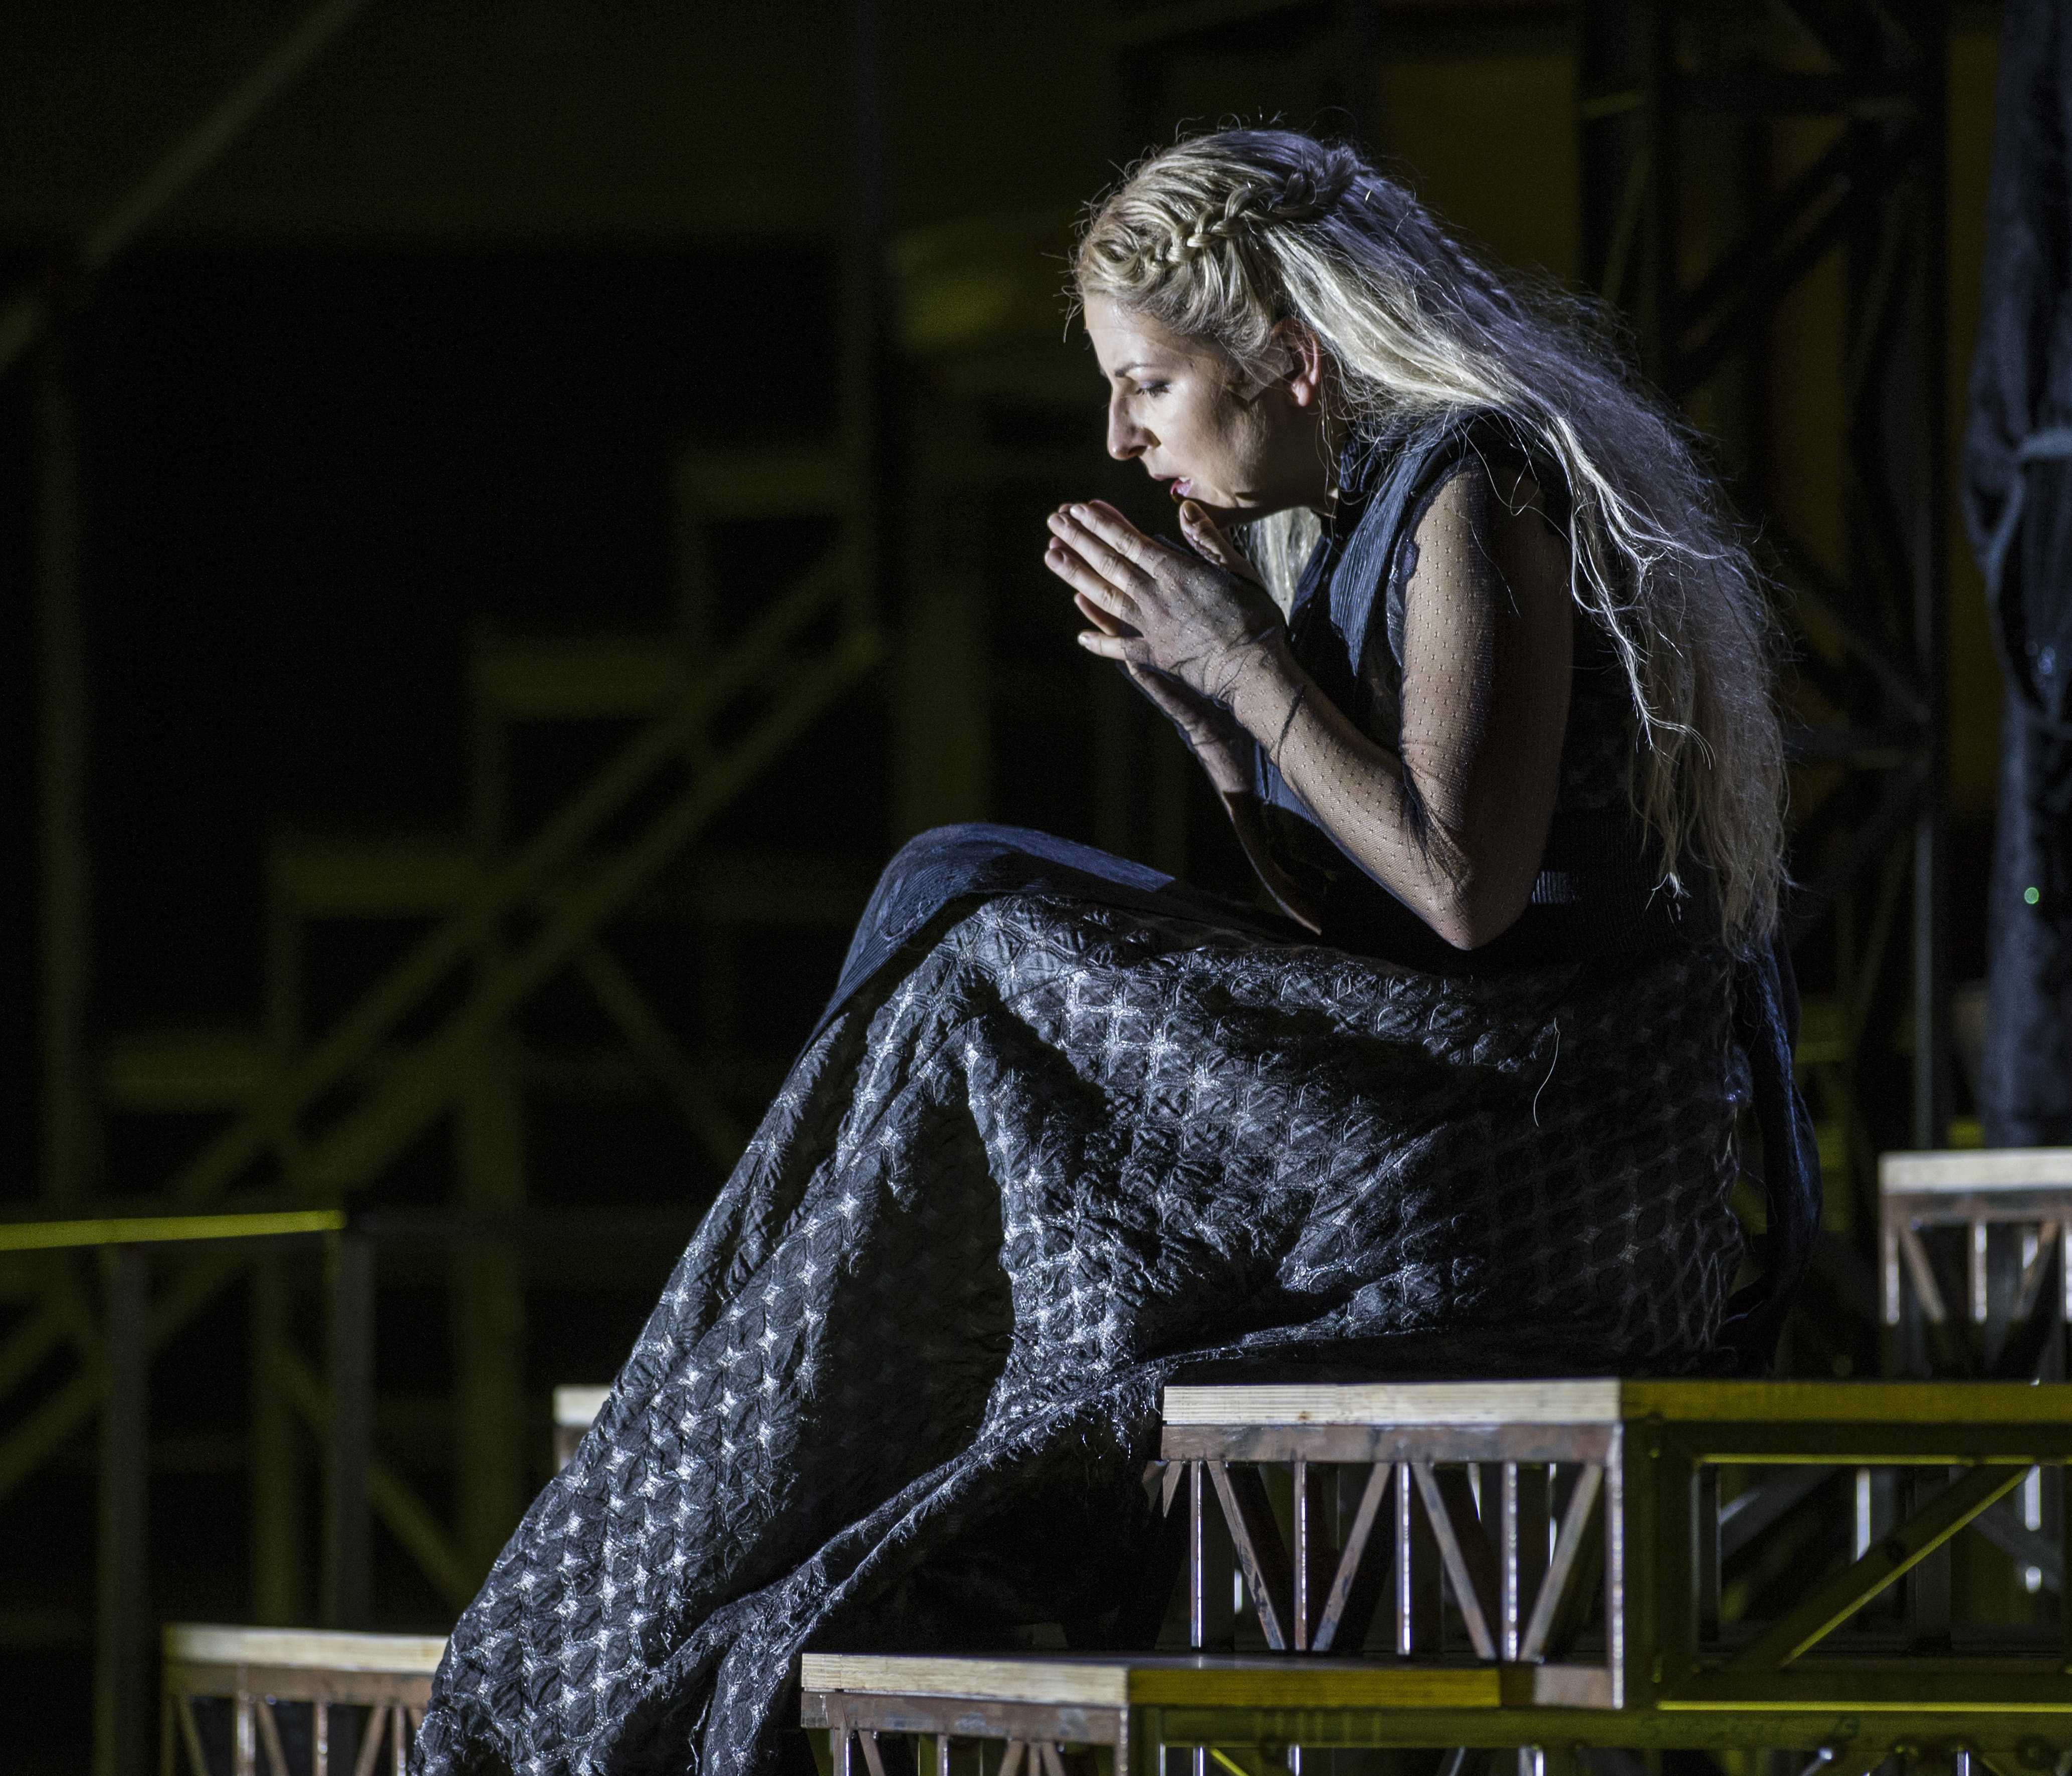 norma-sjalusi-rival-den-norske-opera